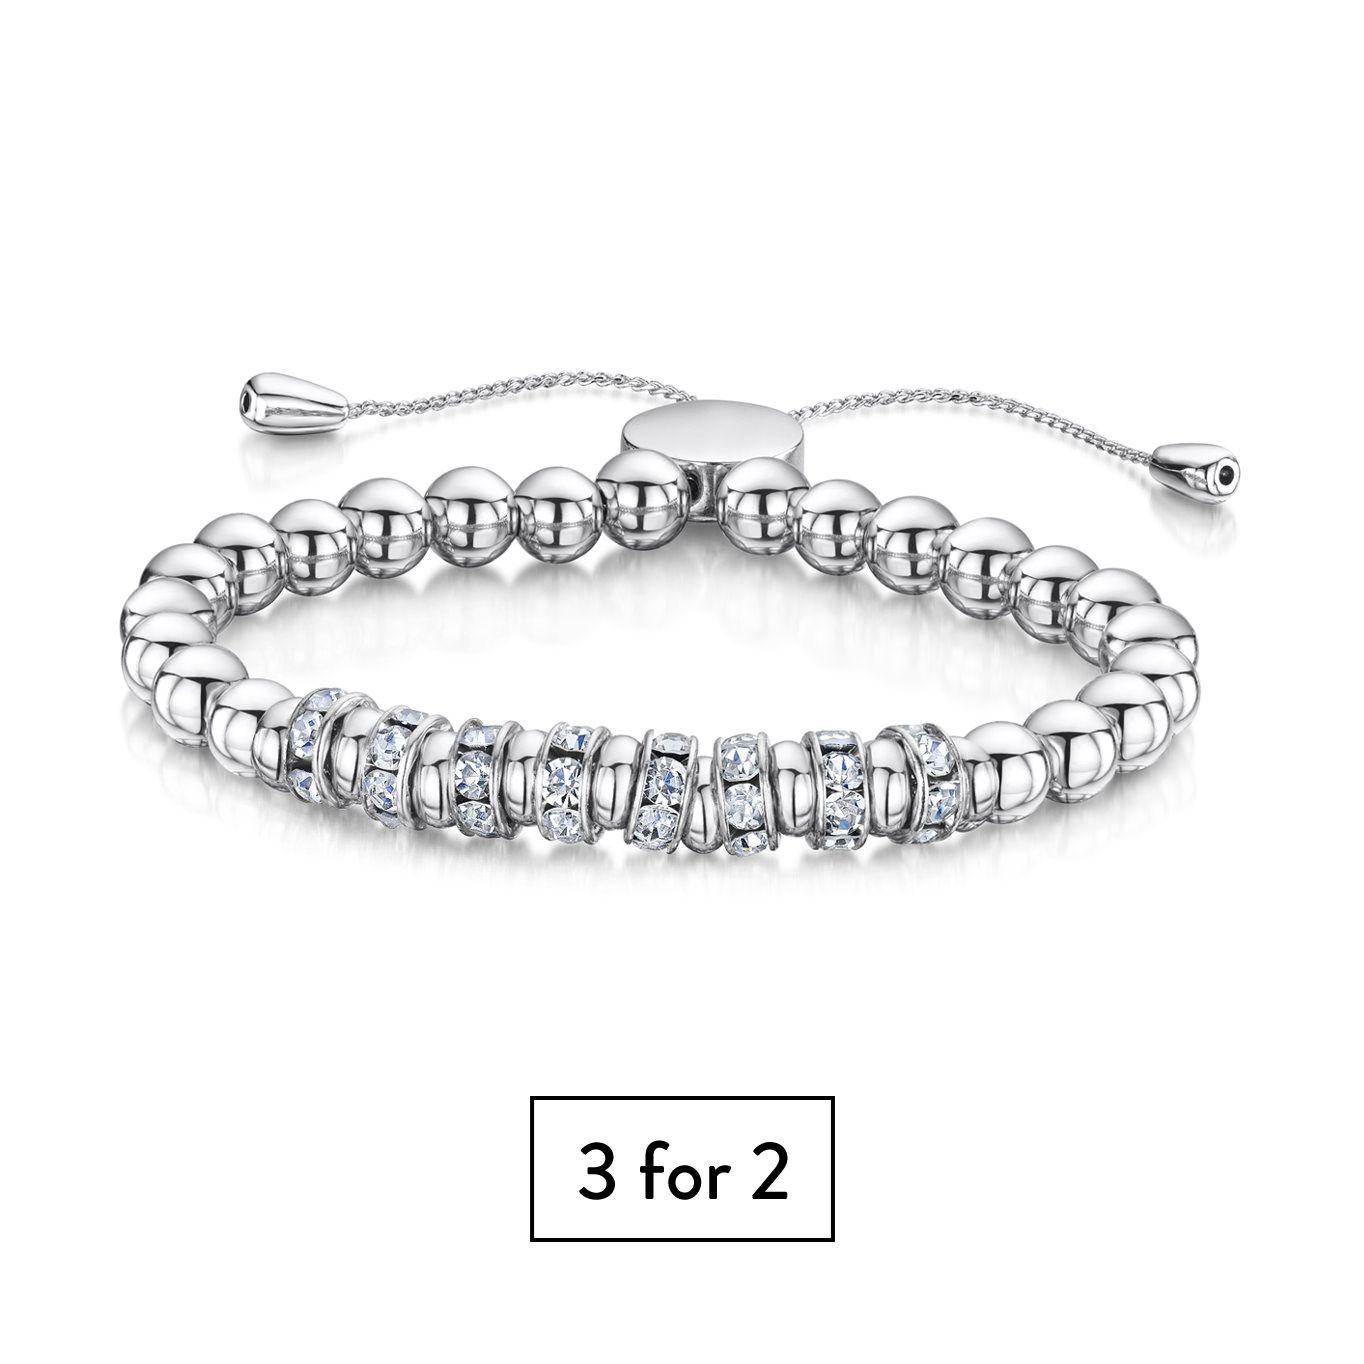 Buckley London Simplicity Bracelet - Rhodium (Cluster Design)